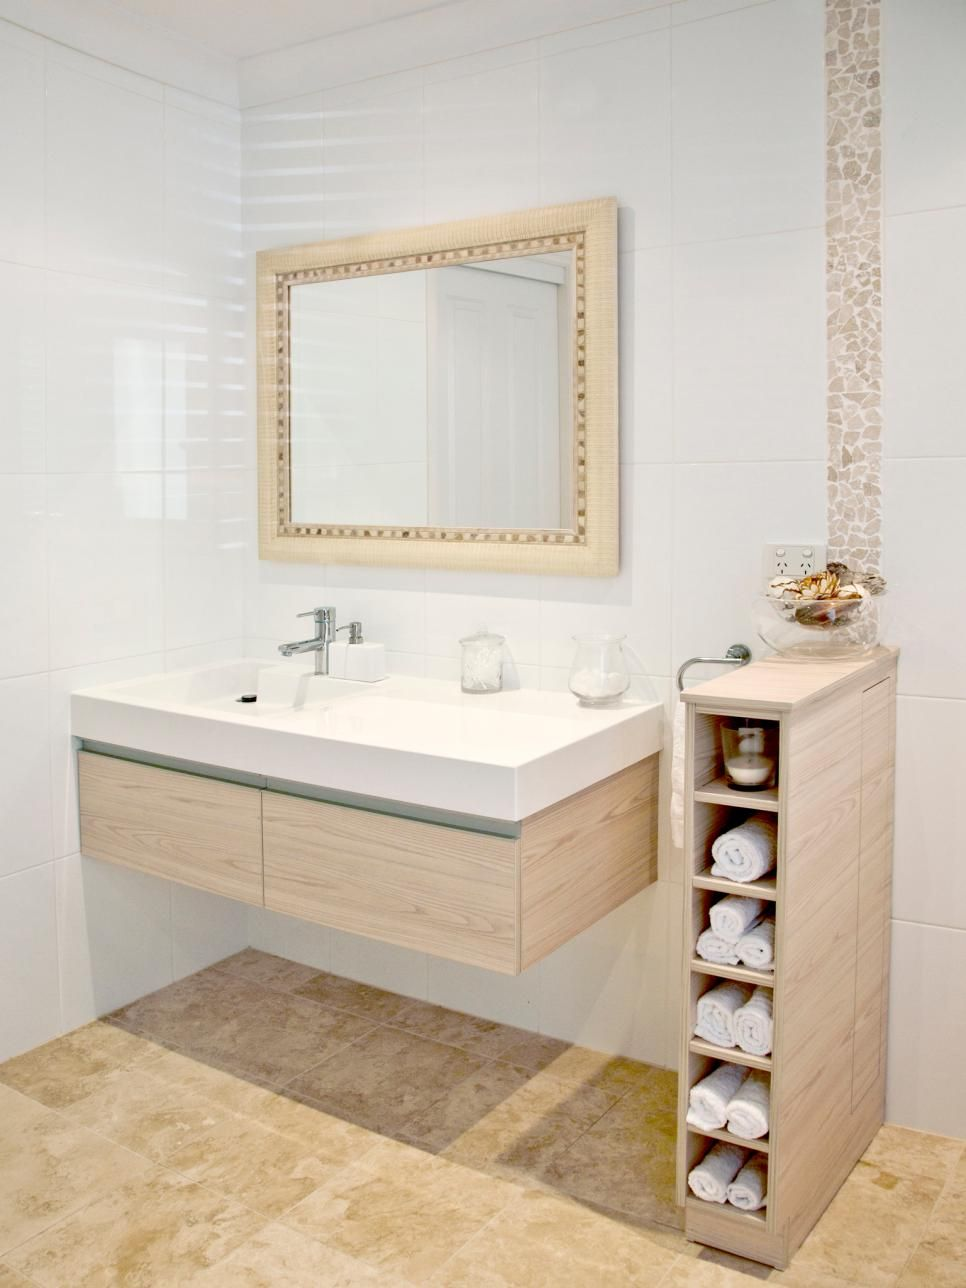 15 Smart Bath Storage Ideas 15 Smart